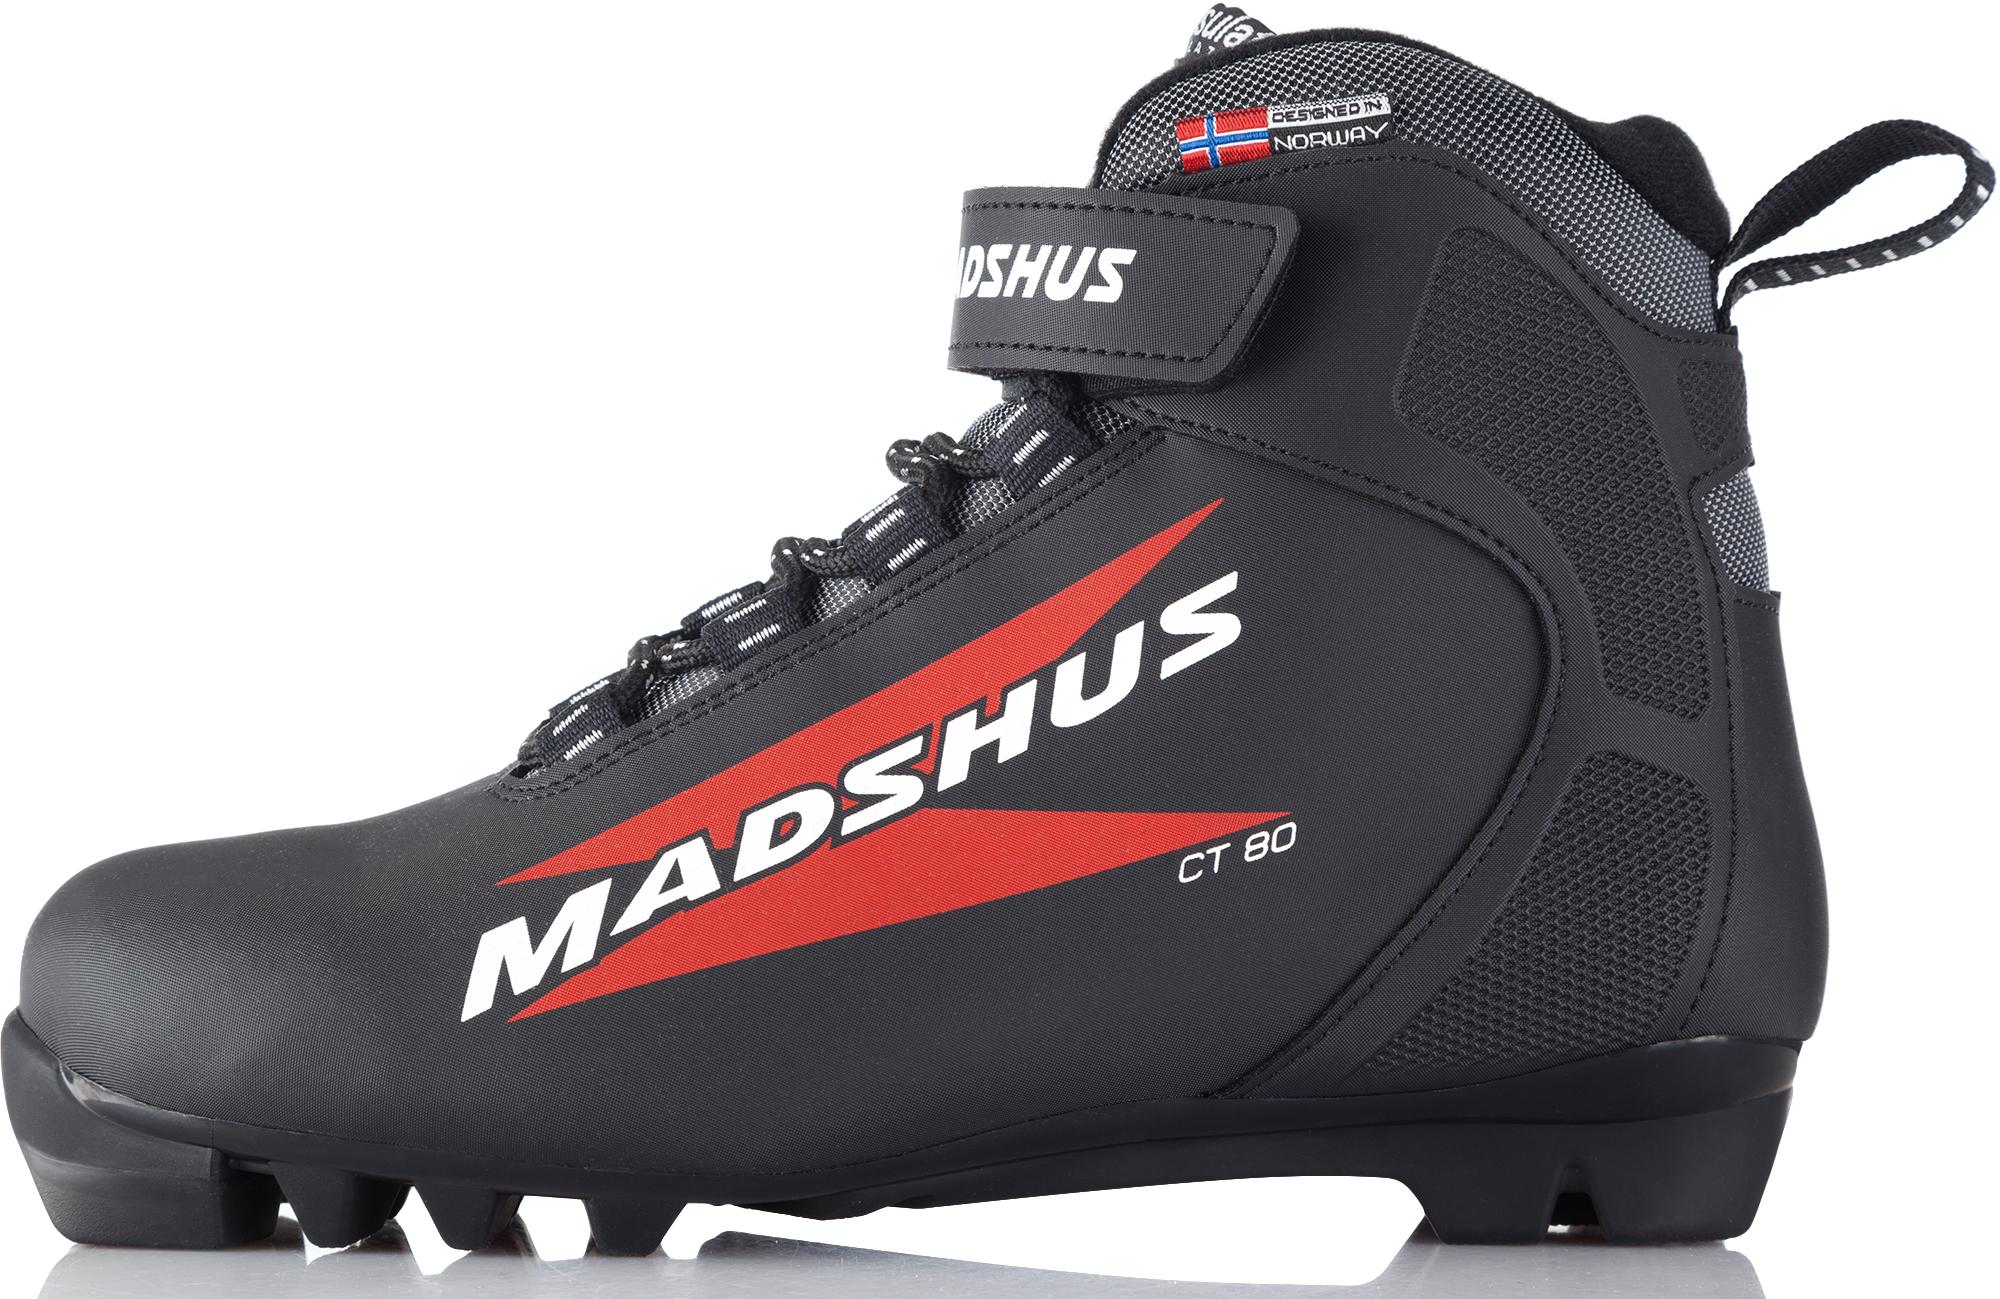 цена на Madshus Ботинки для беговых лыж Madshus CT 80